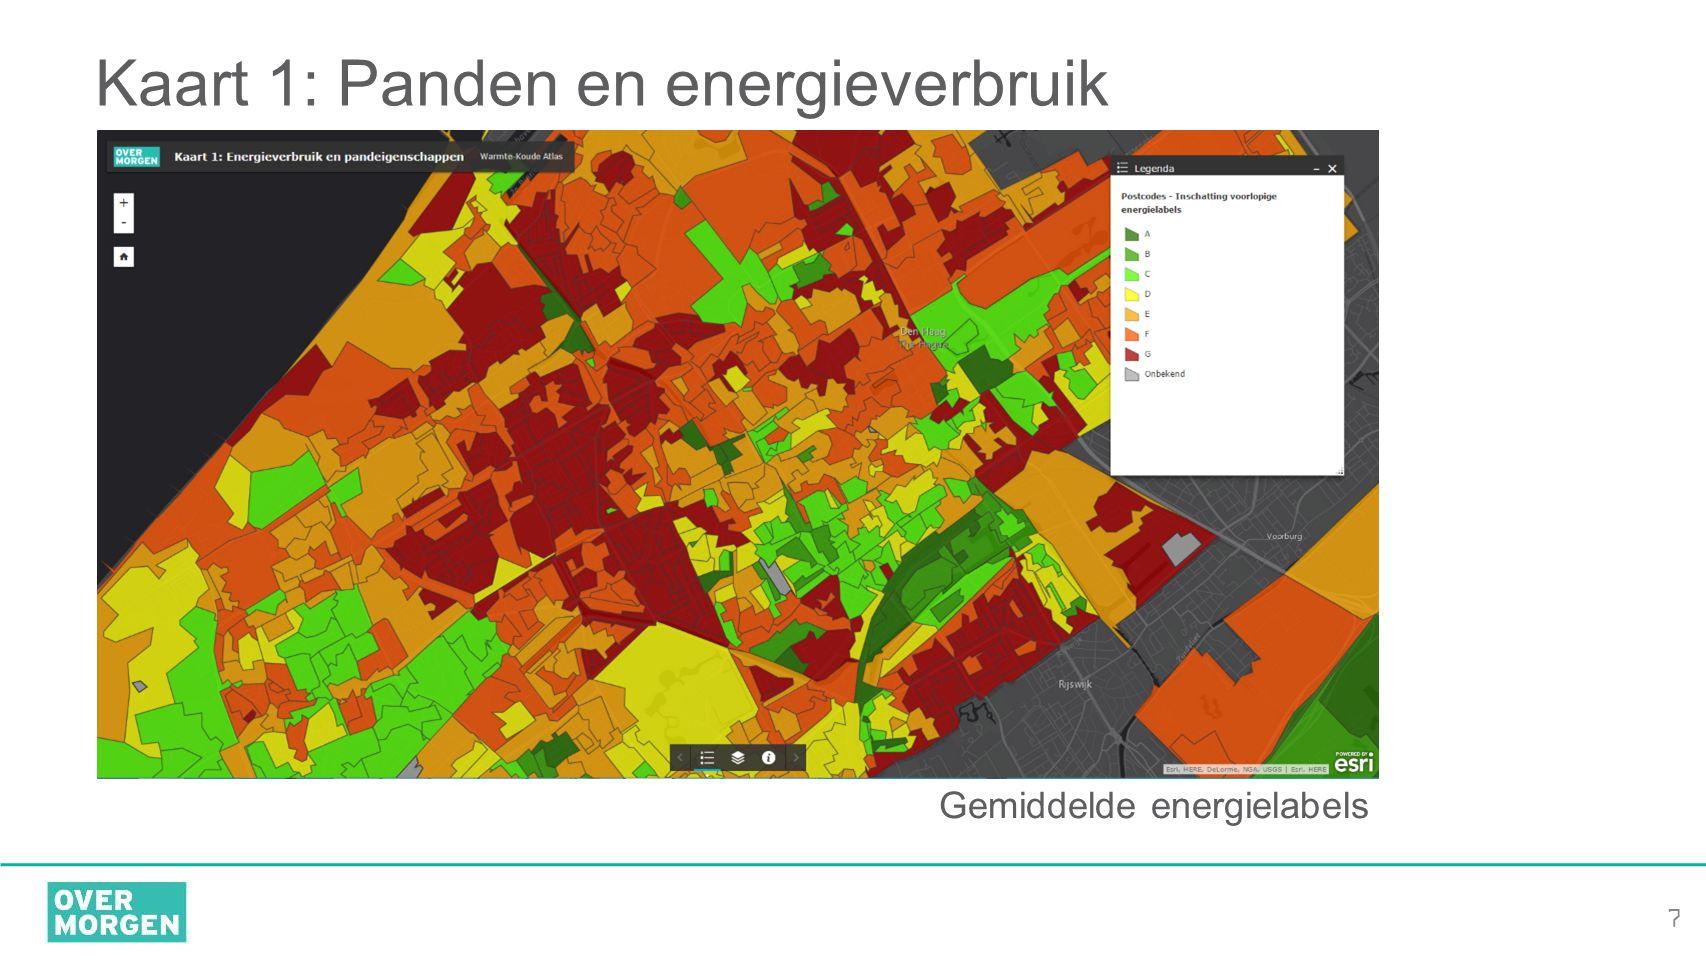 7 Kaart 1: Panden en energieverbruik Gemiddelde energielabels